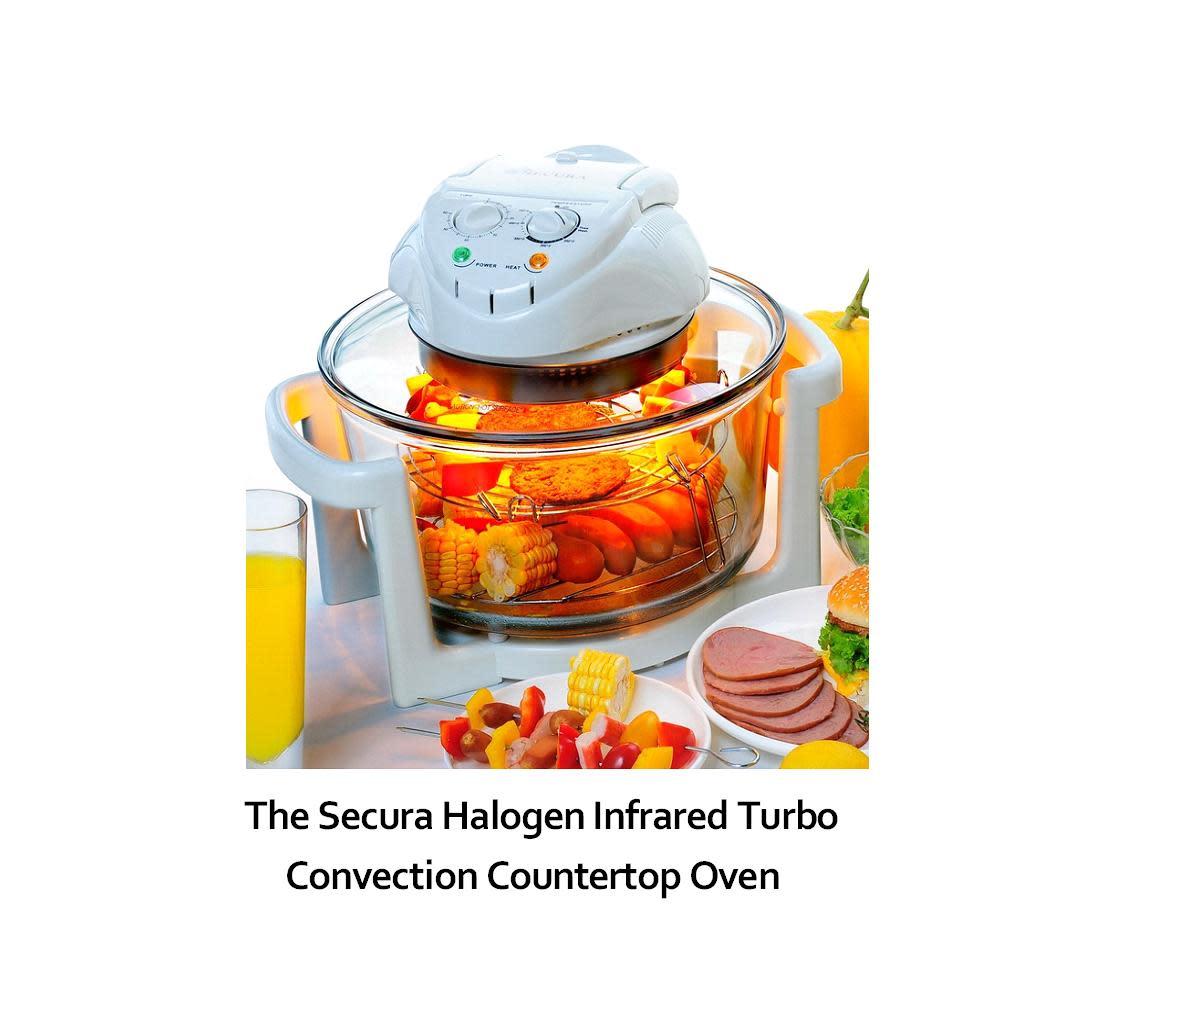 Halogen Countertop Oven Reviews : Secura Infrared Countertop Halogen Oven Review